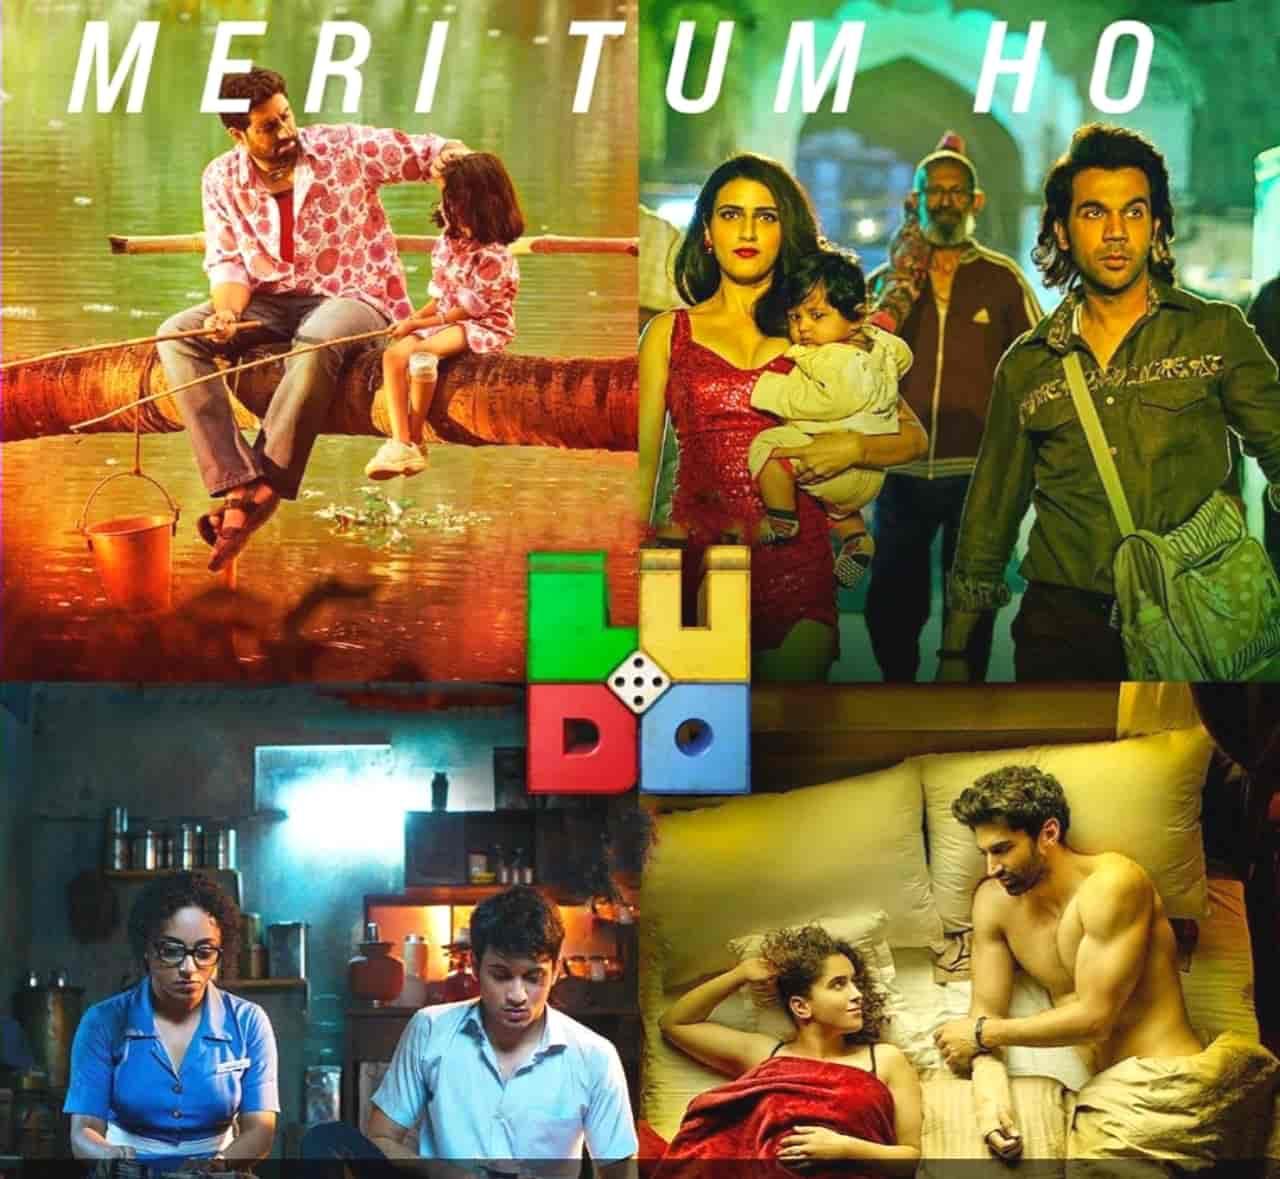 Meri Tum Ho Hindi Song Image From Movie Ludo